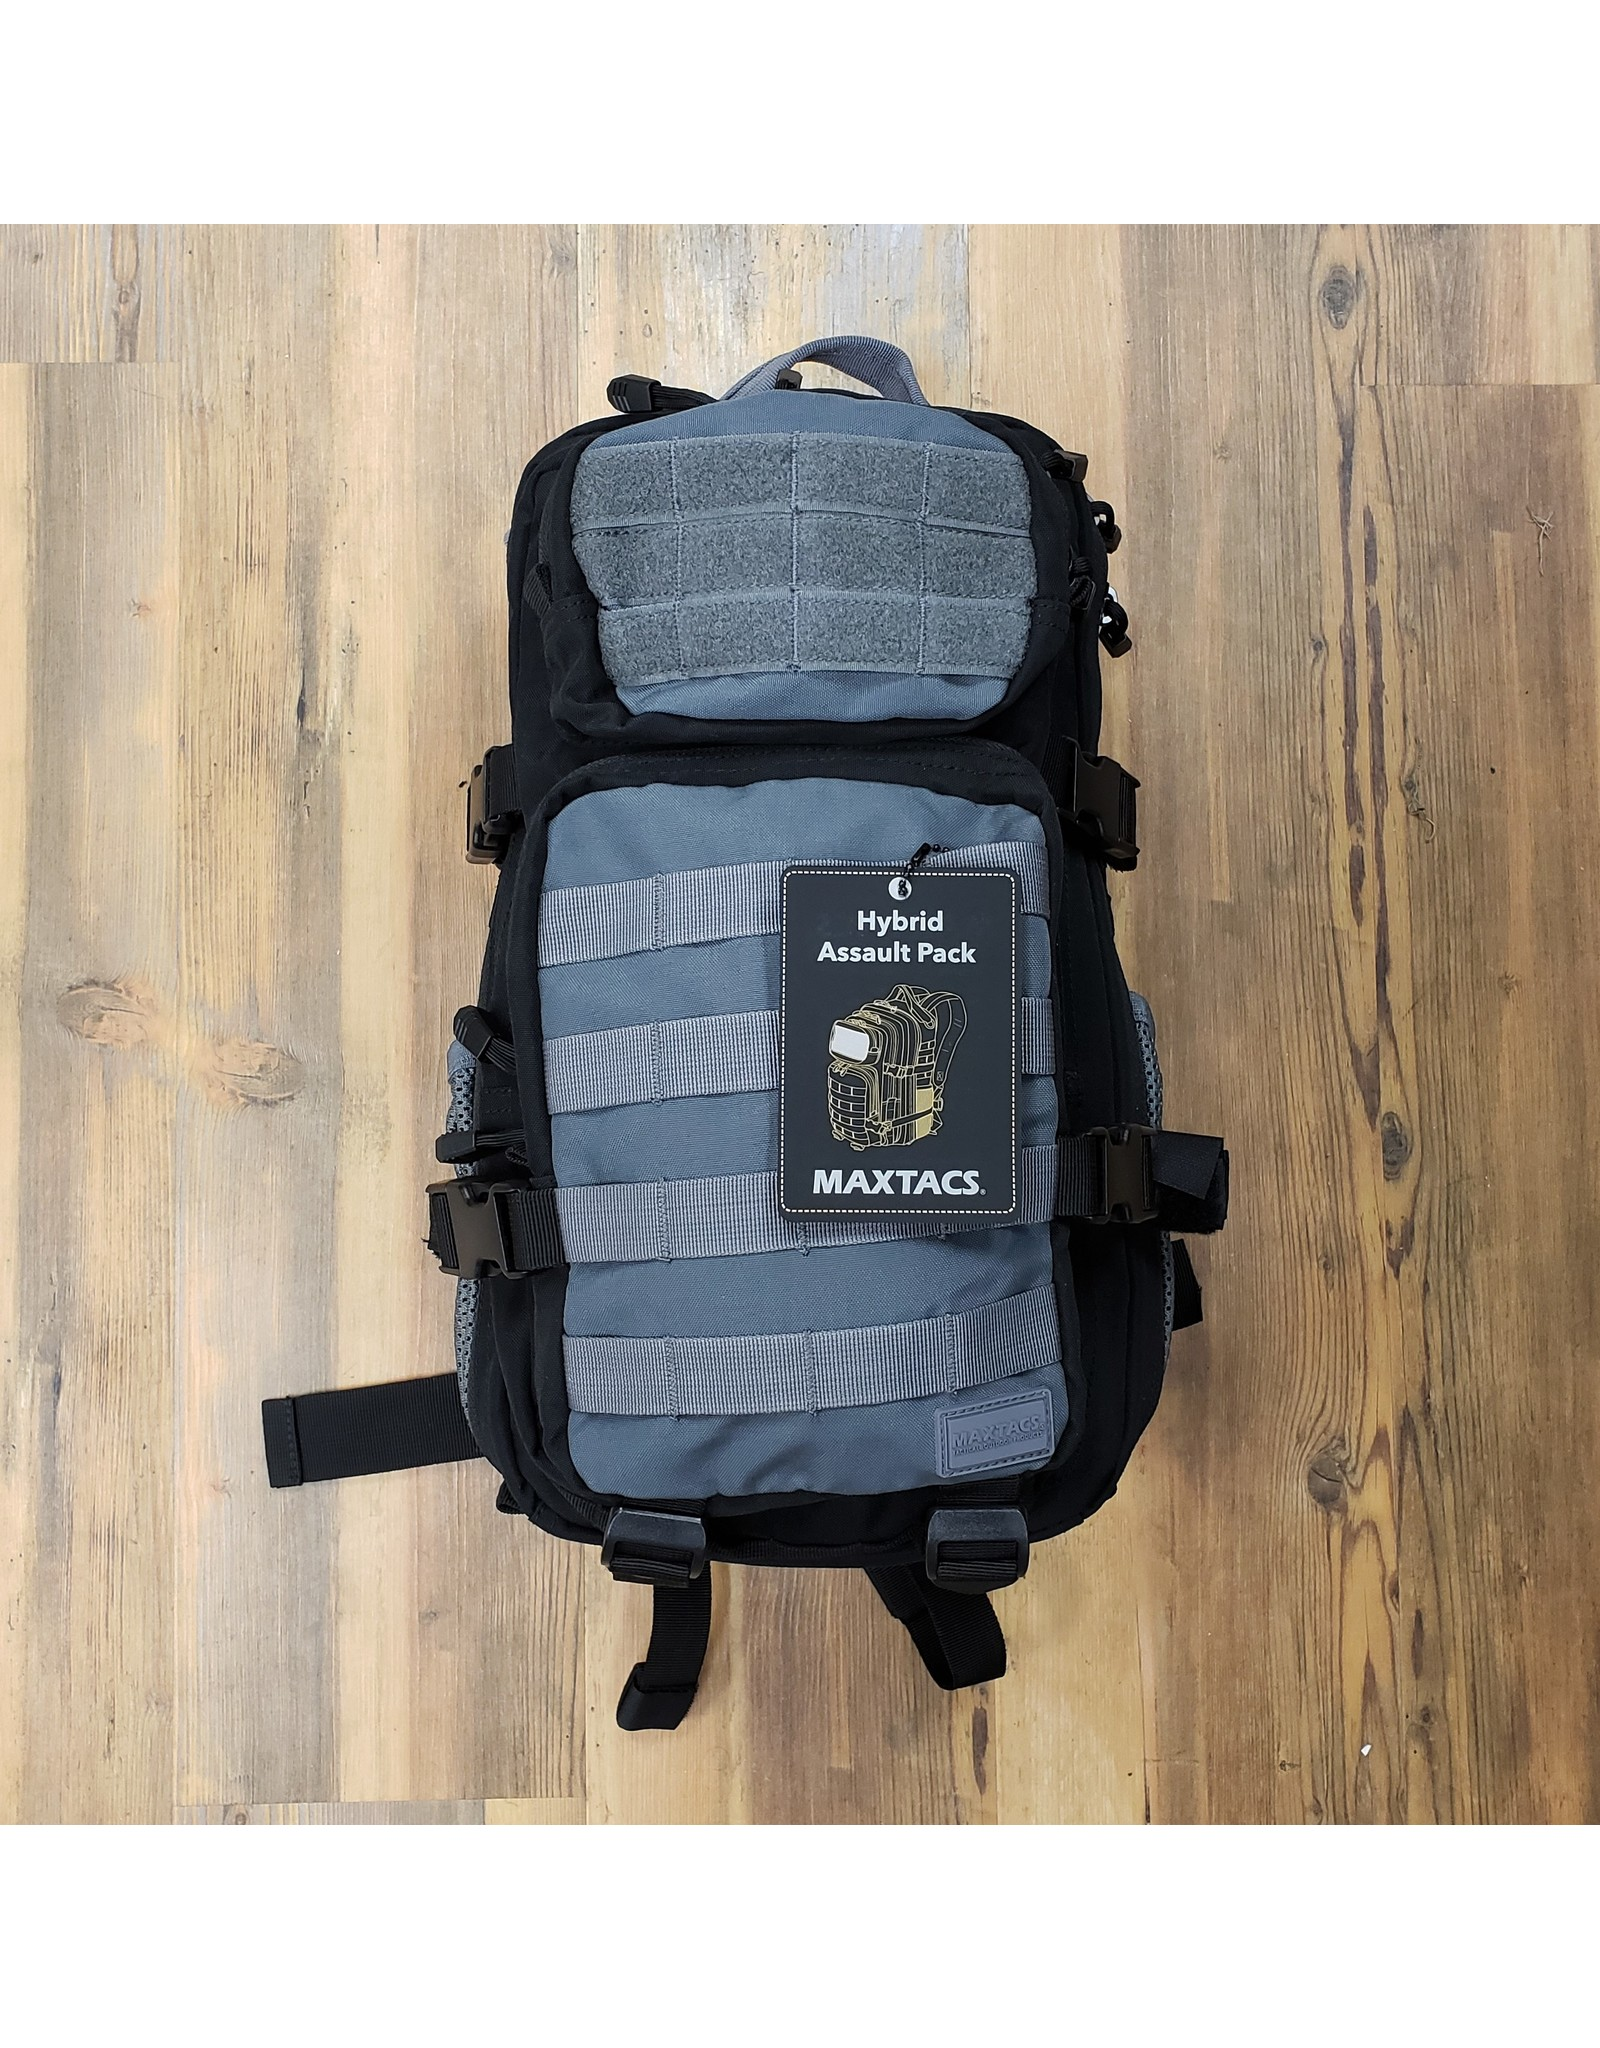 MAXTACS HYBRID ASSAULT PACK BLK/GREY 110008